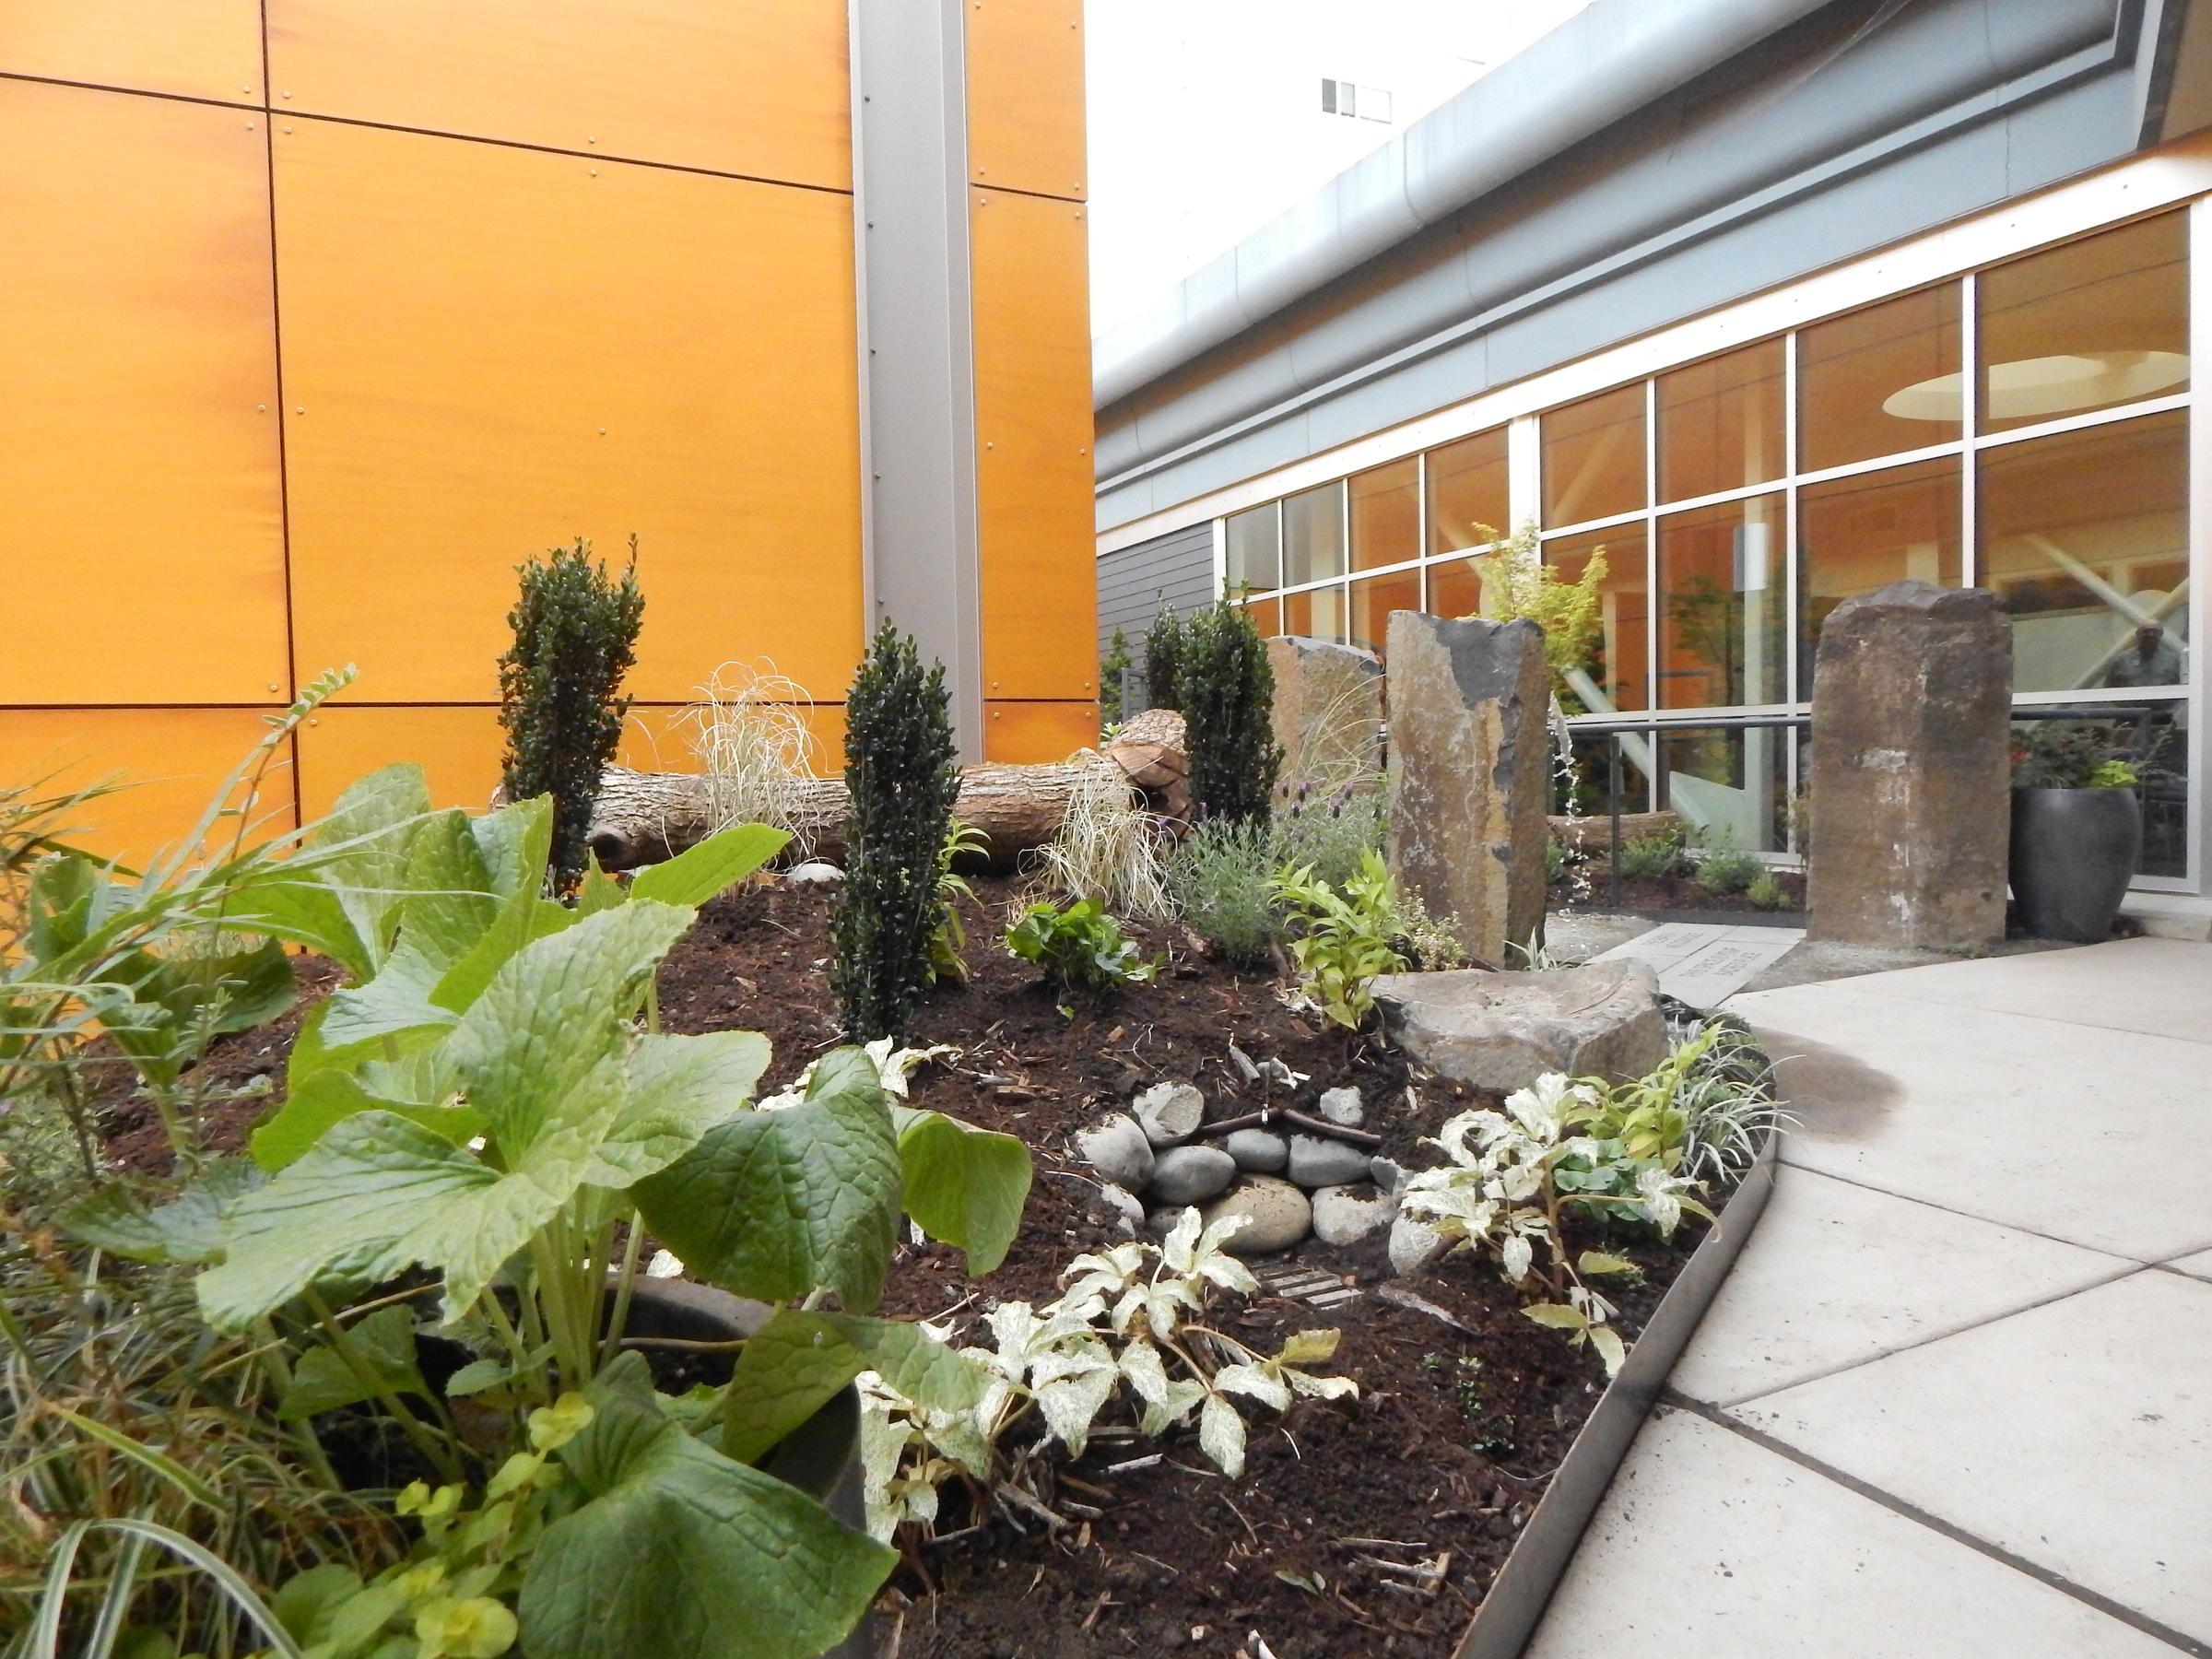 Seattle Students Create Healing Garden For Veterans